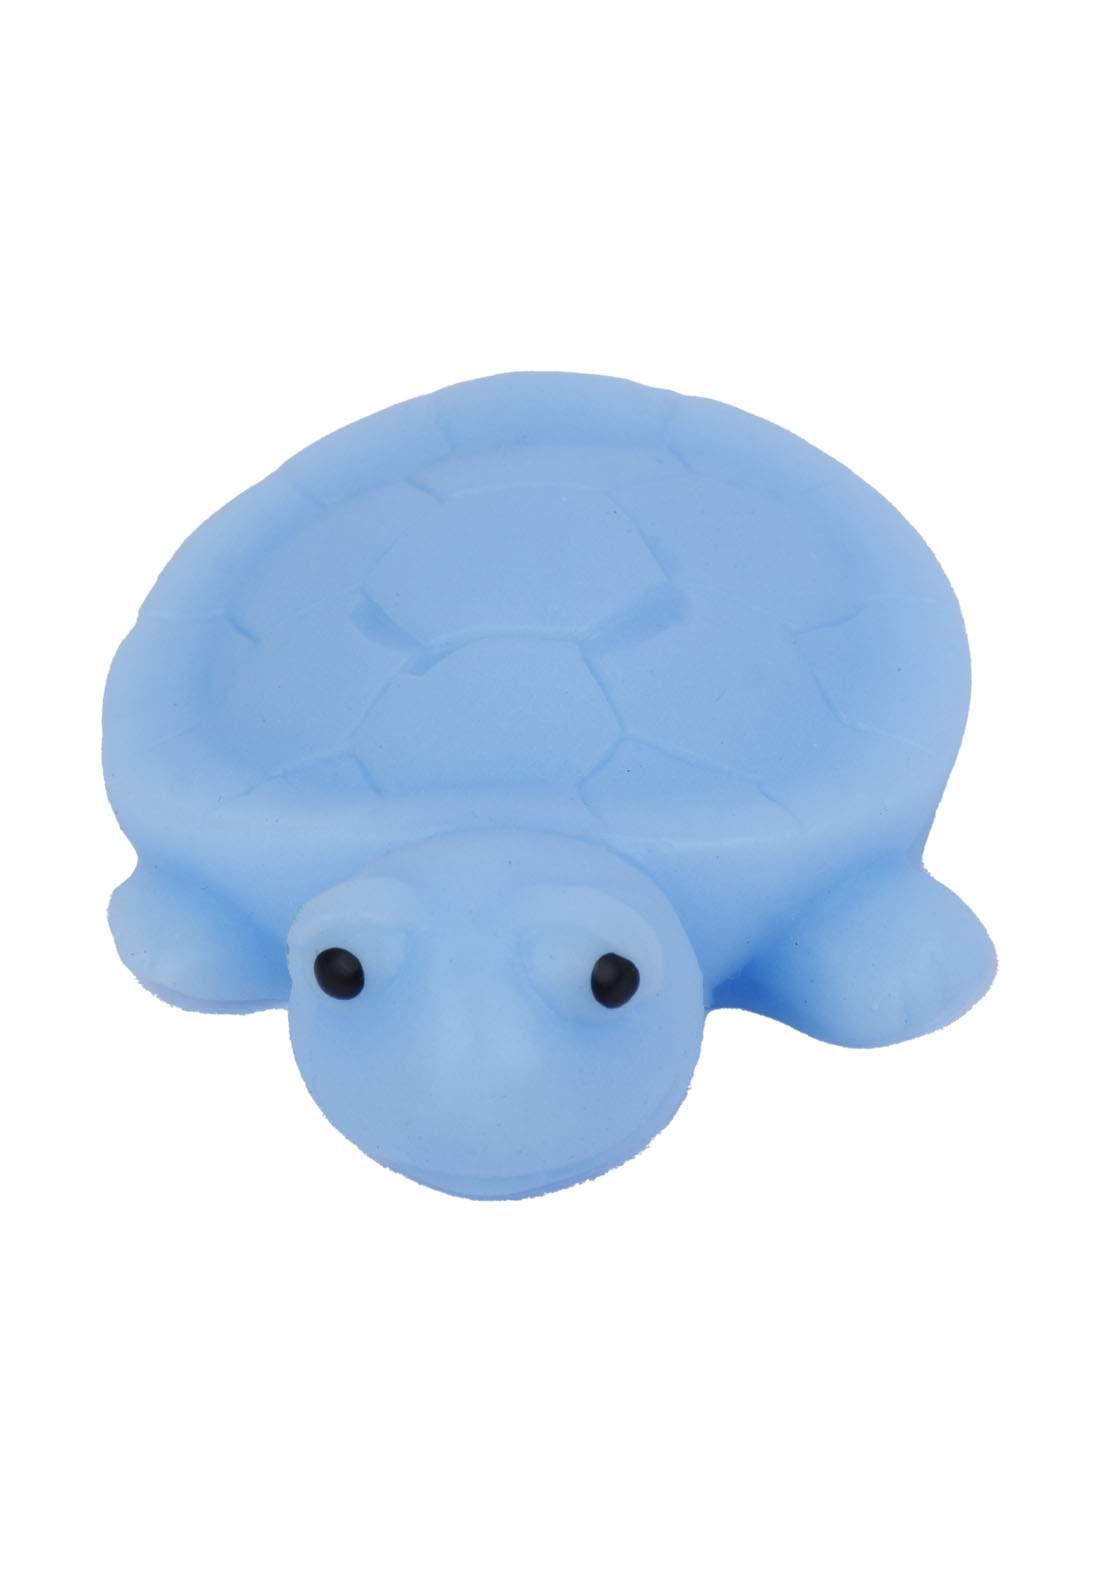 Stress Toy لعبة ازالة التوتر بشكل سلحفات